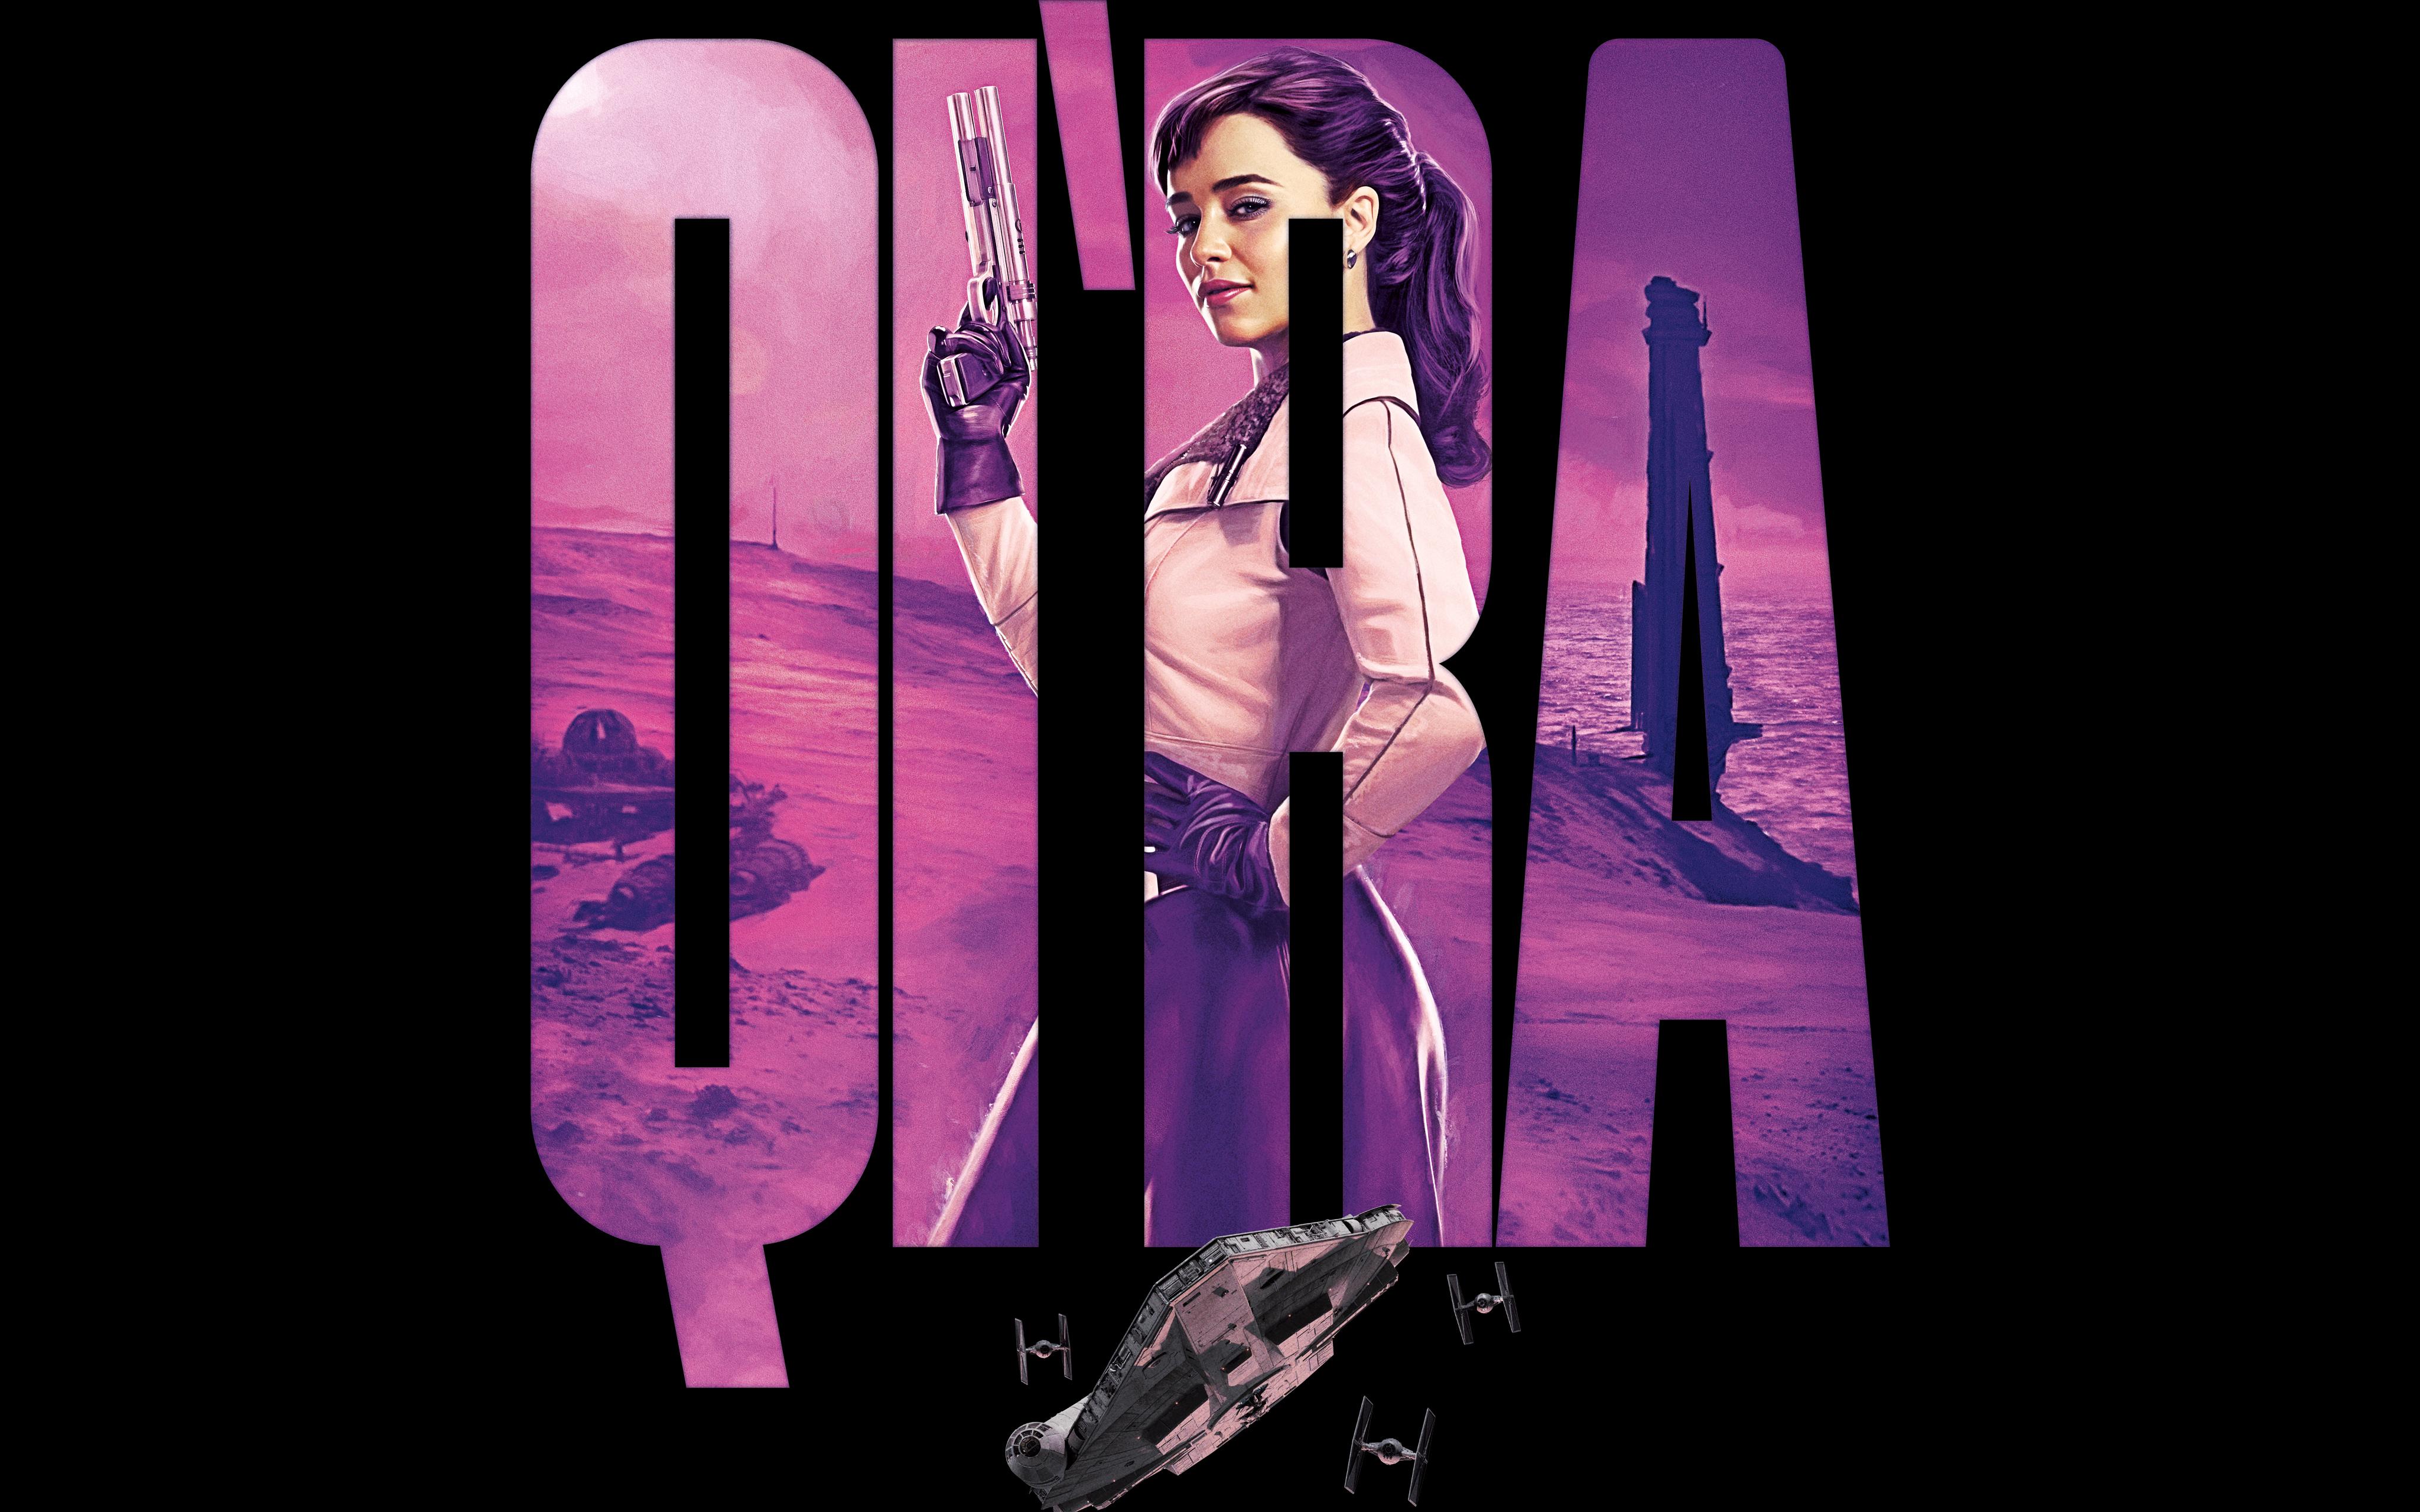 Emilia Clarke As Qira Solo A Star Wars Story 4k 8k 4096x2560 Wallpaper Teahub Io